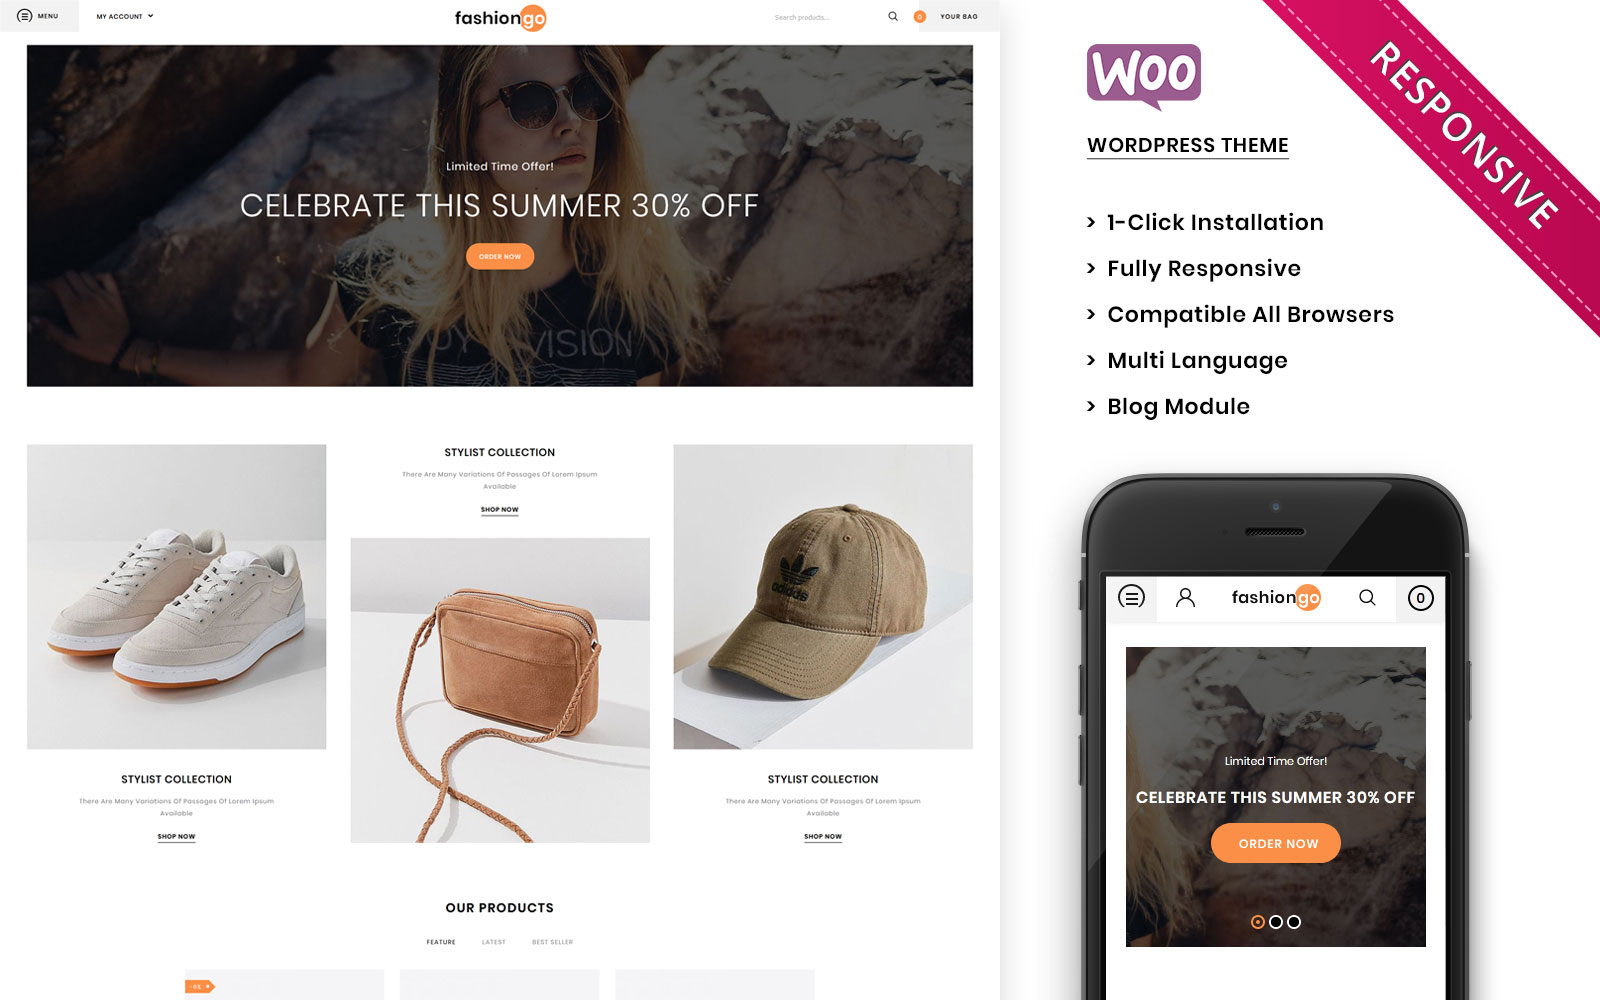 Fashiongo - The Fashion Store Responsive WooCommerce Theme